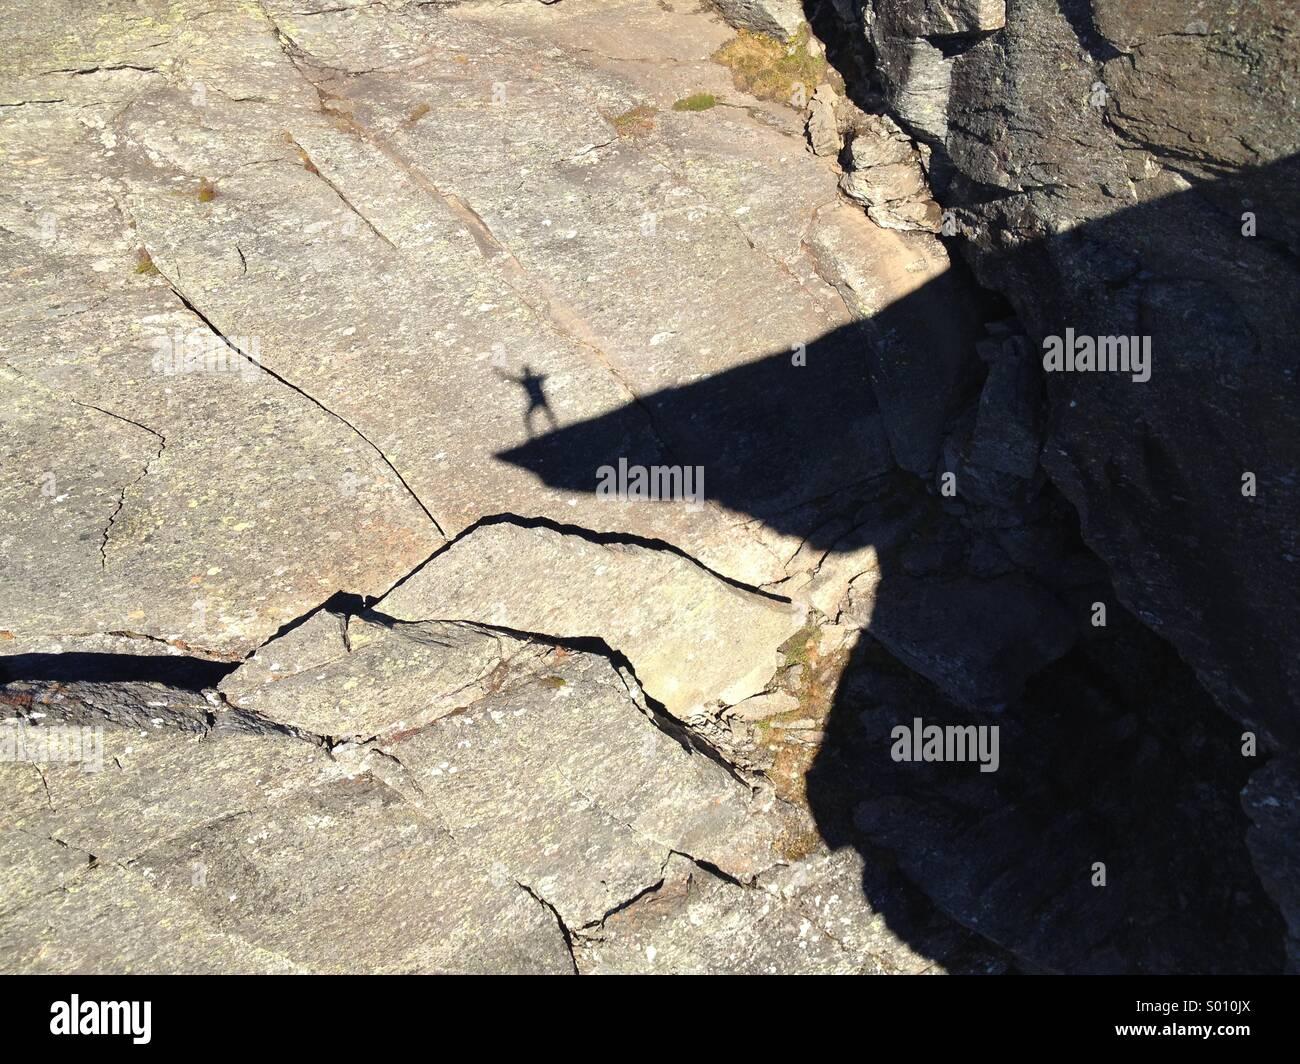 Man shadow dancing on Trolltunga, tyssedalen, Odda, Norway. Stock Photo